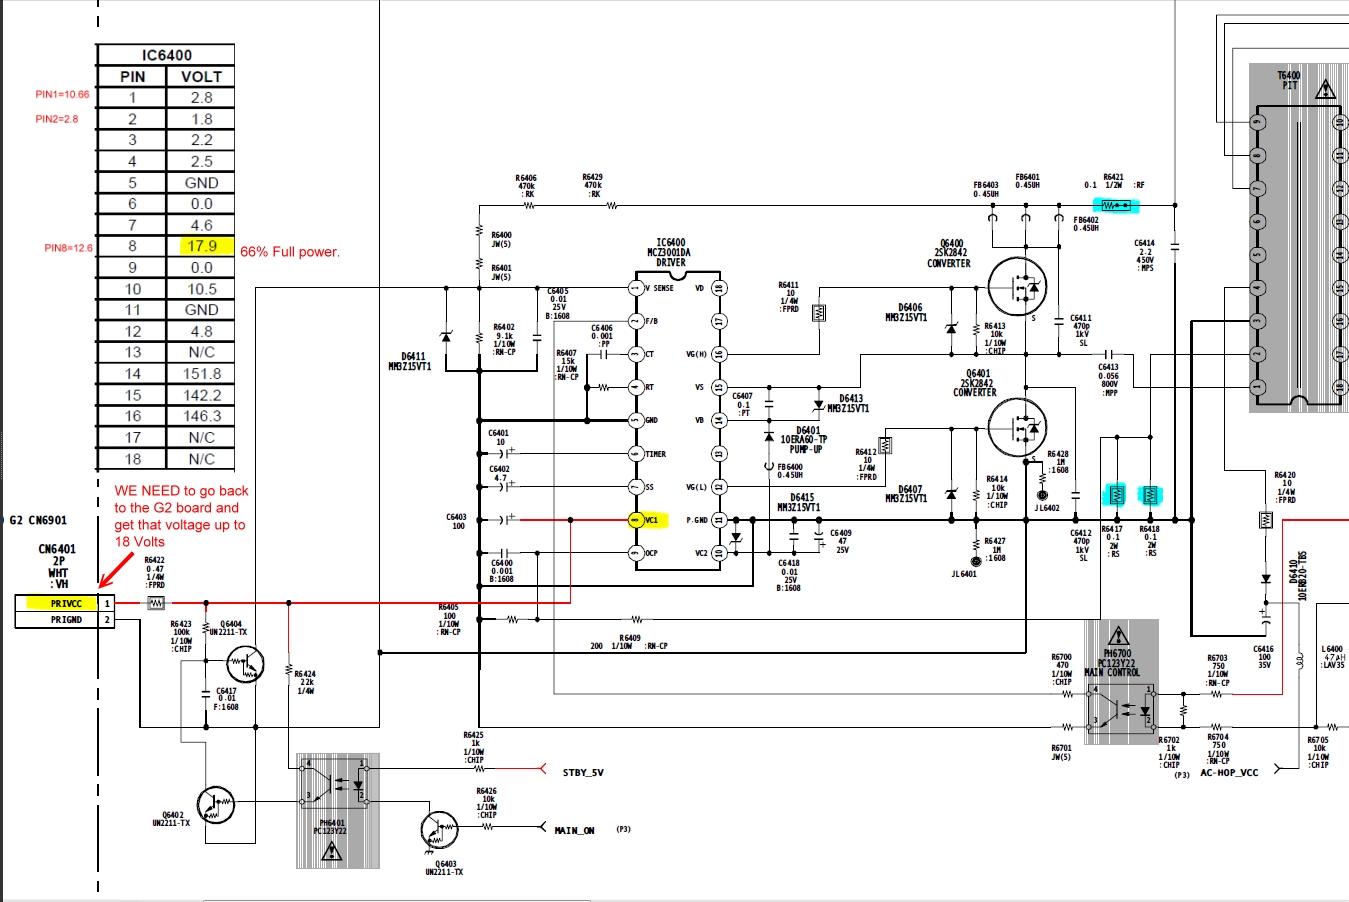 Original Problemon Click 4 Blinksclick Off5 Blinks Then 10 Scrap Circuit Board Manufacturers In Lulusosocom Graphic